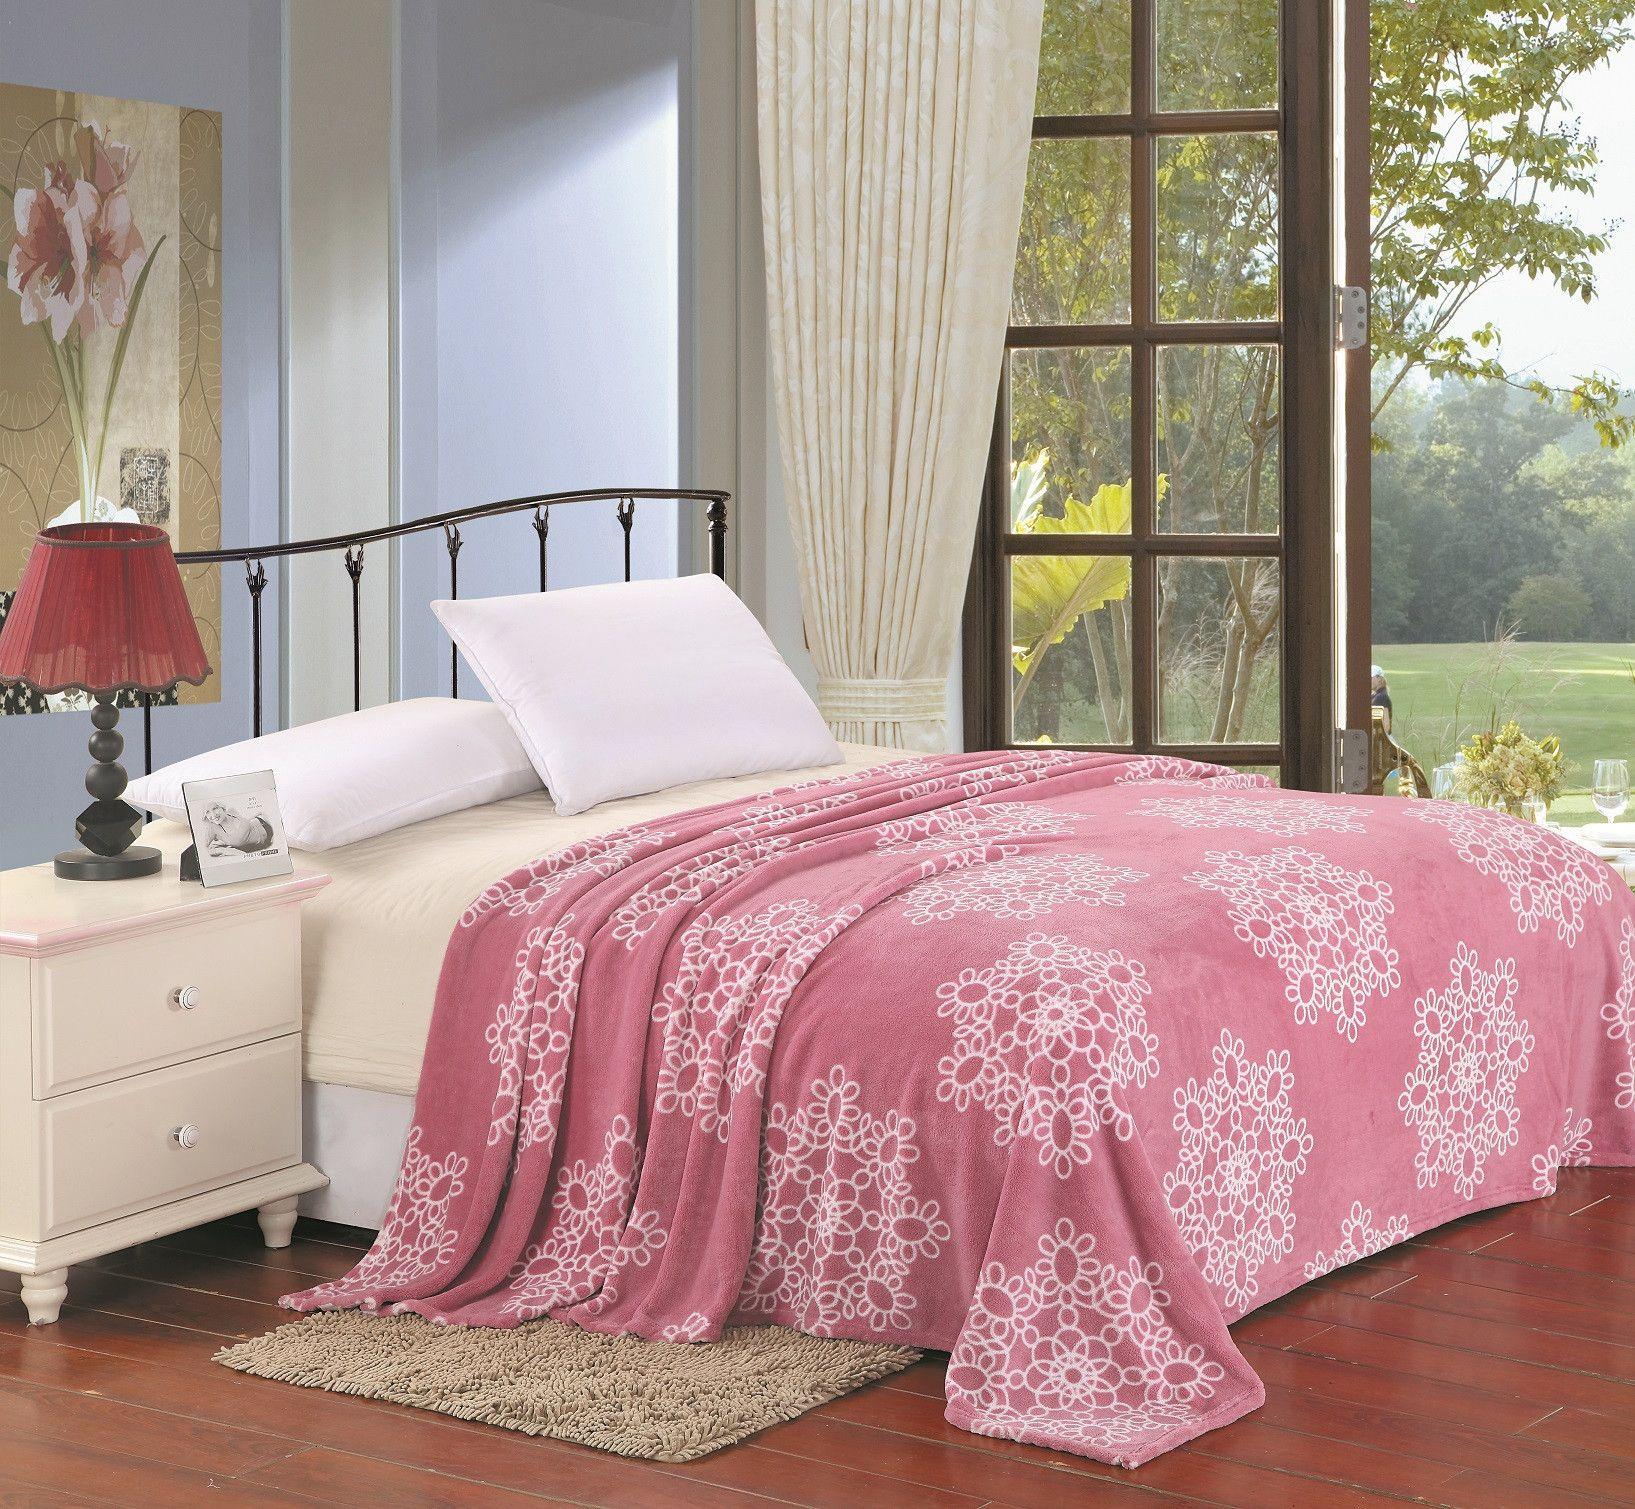 Ultra Plush Snowflake Design Queen Size Microplush Blanket - Pink